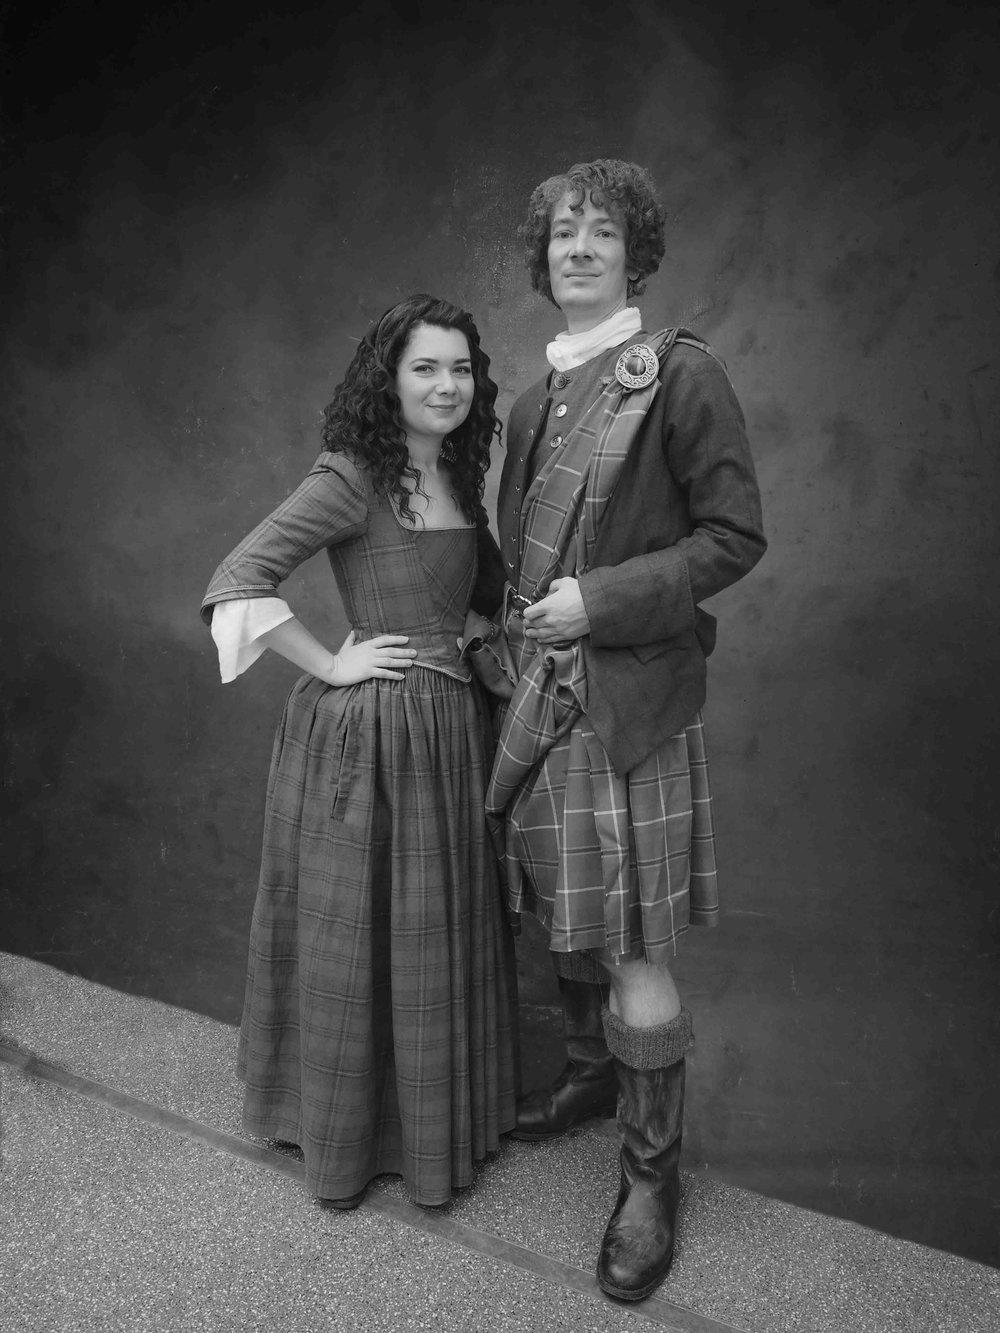 Outlander - Inspired by Outlander (Starz Network)Claire & Jamie Fraser - Featured here in their traditional Scottish Highlander kilt,